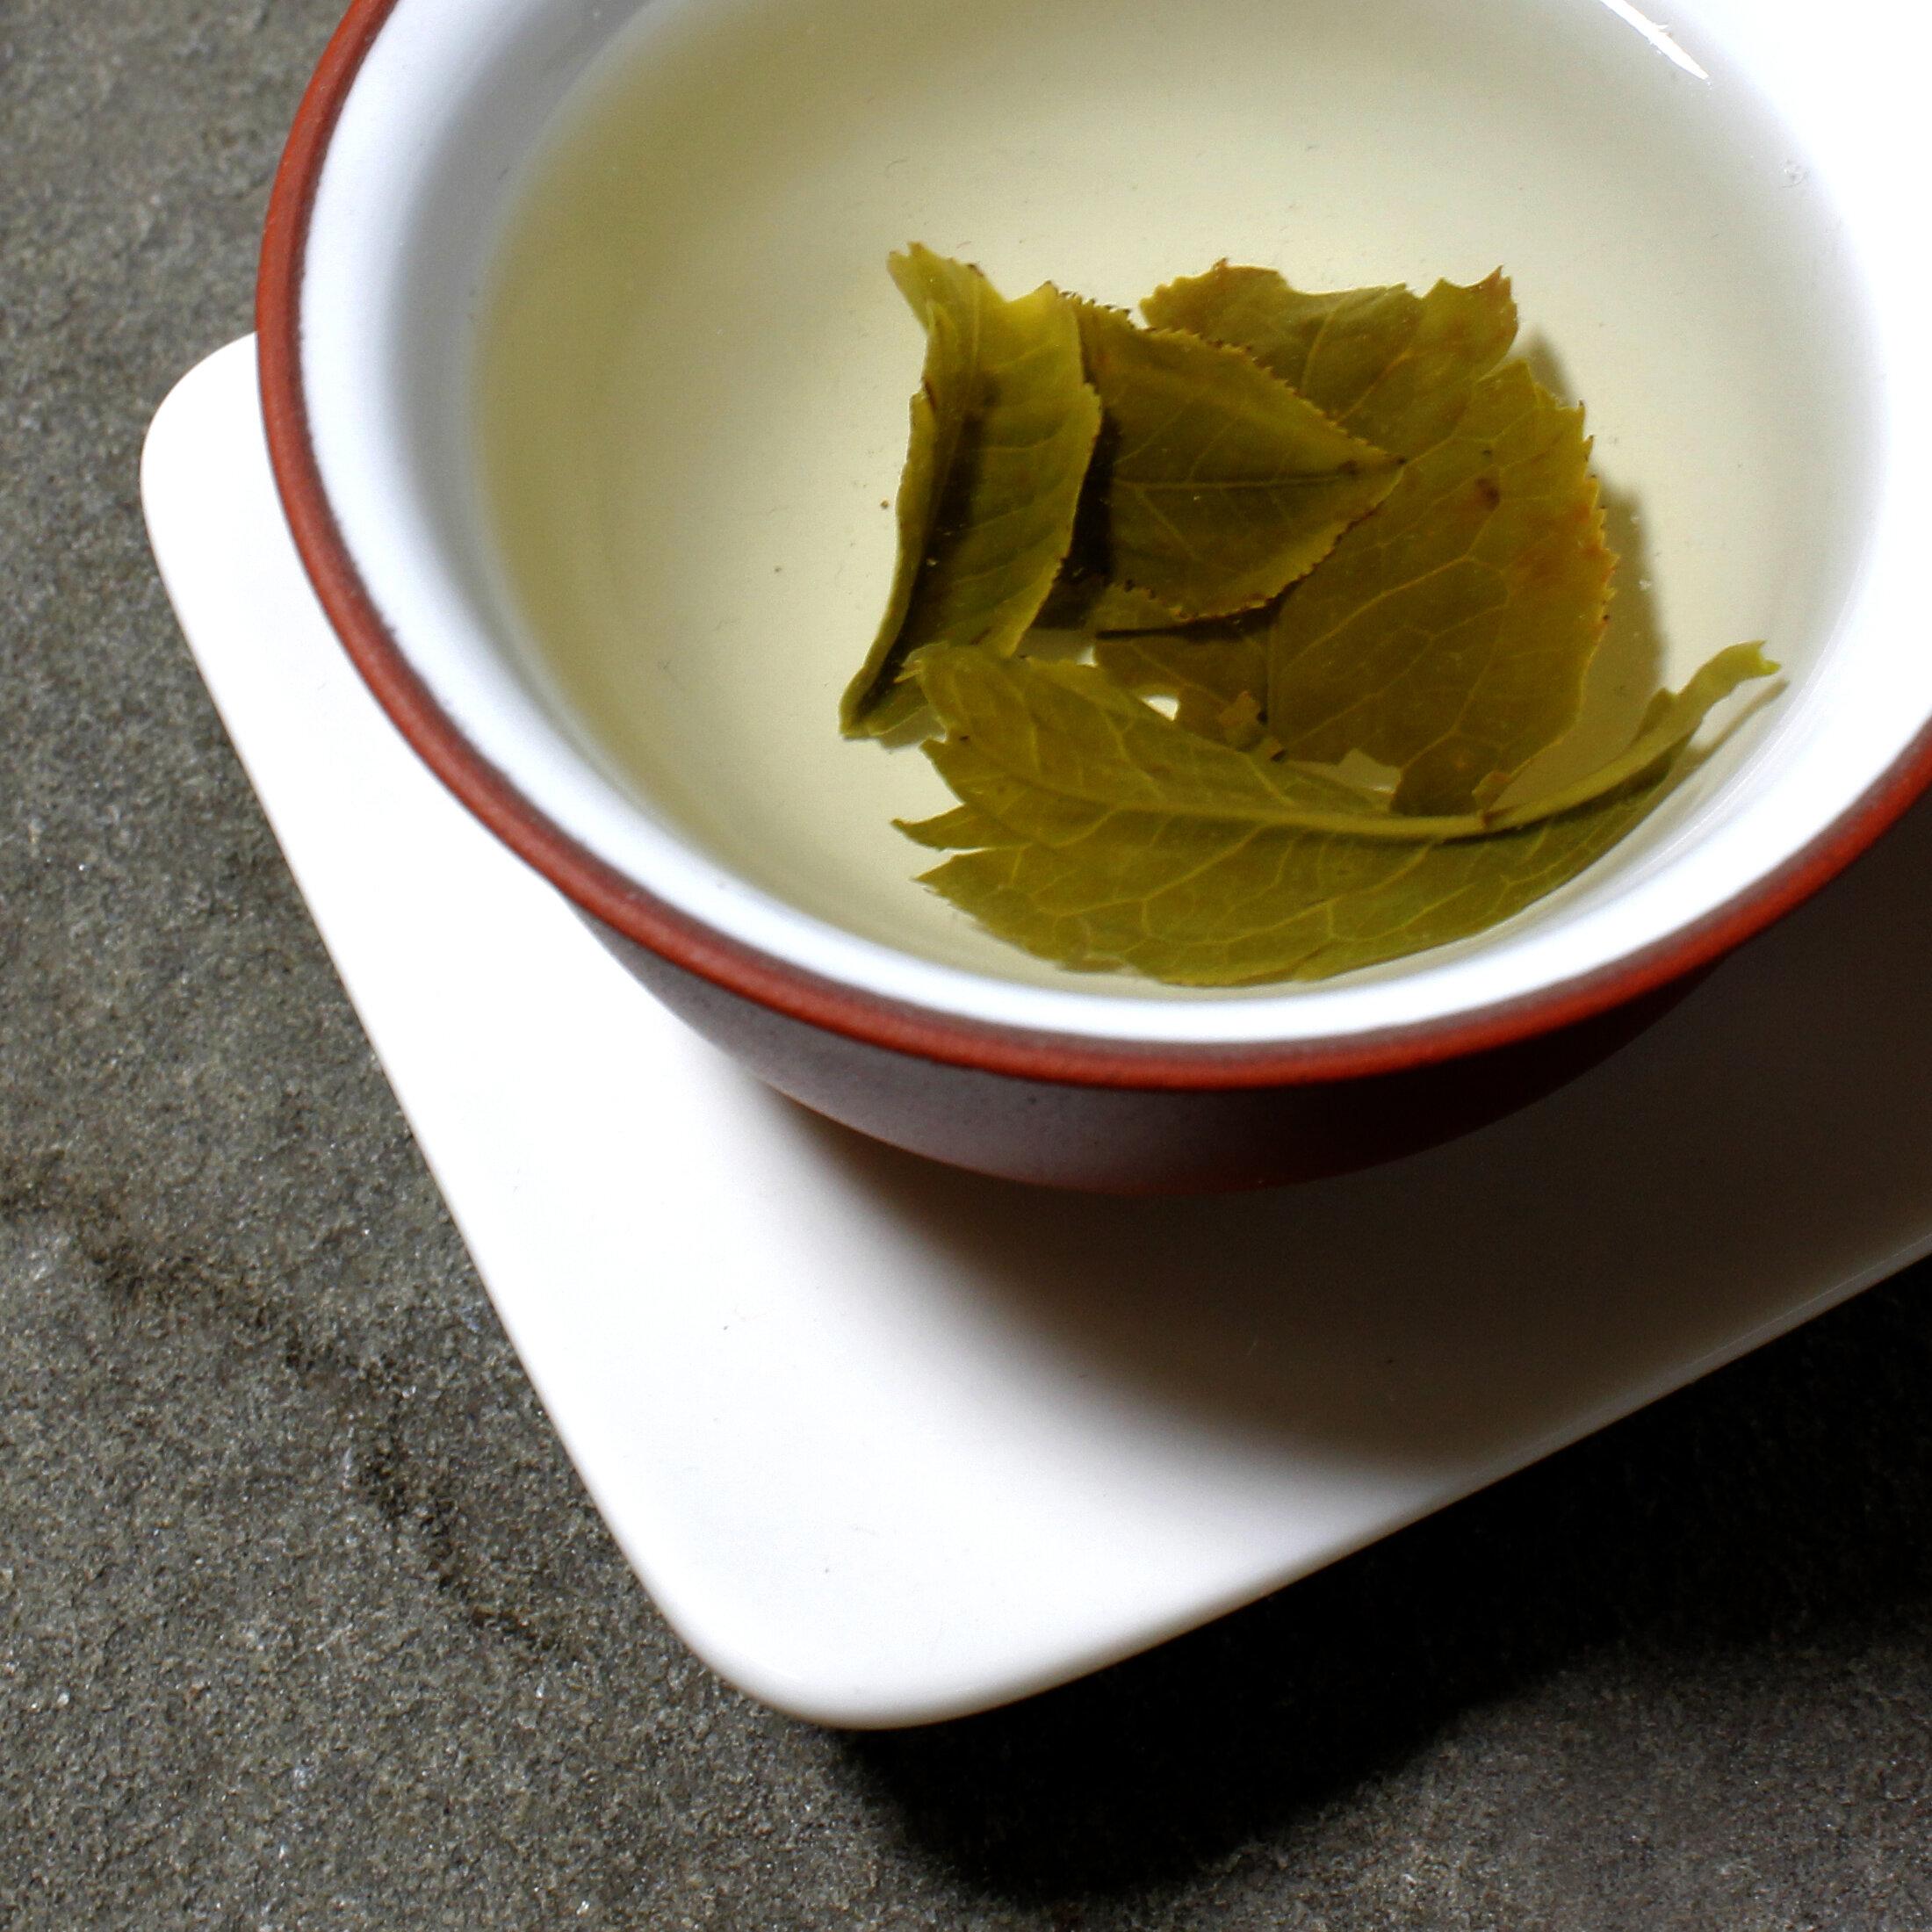 green-silk-hunan-china-green-whole-leaf-loose-mem-tea-itw3-2019a.jpg